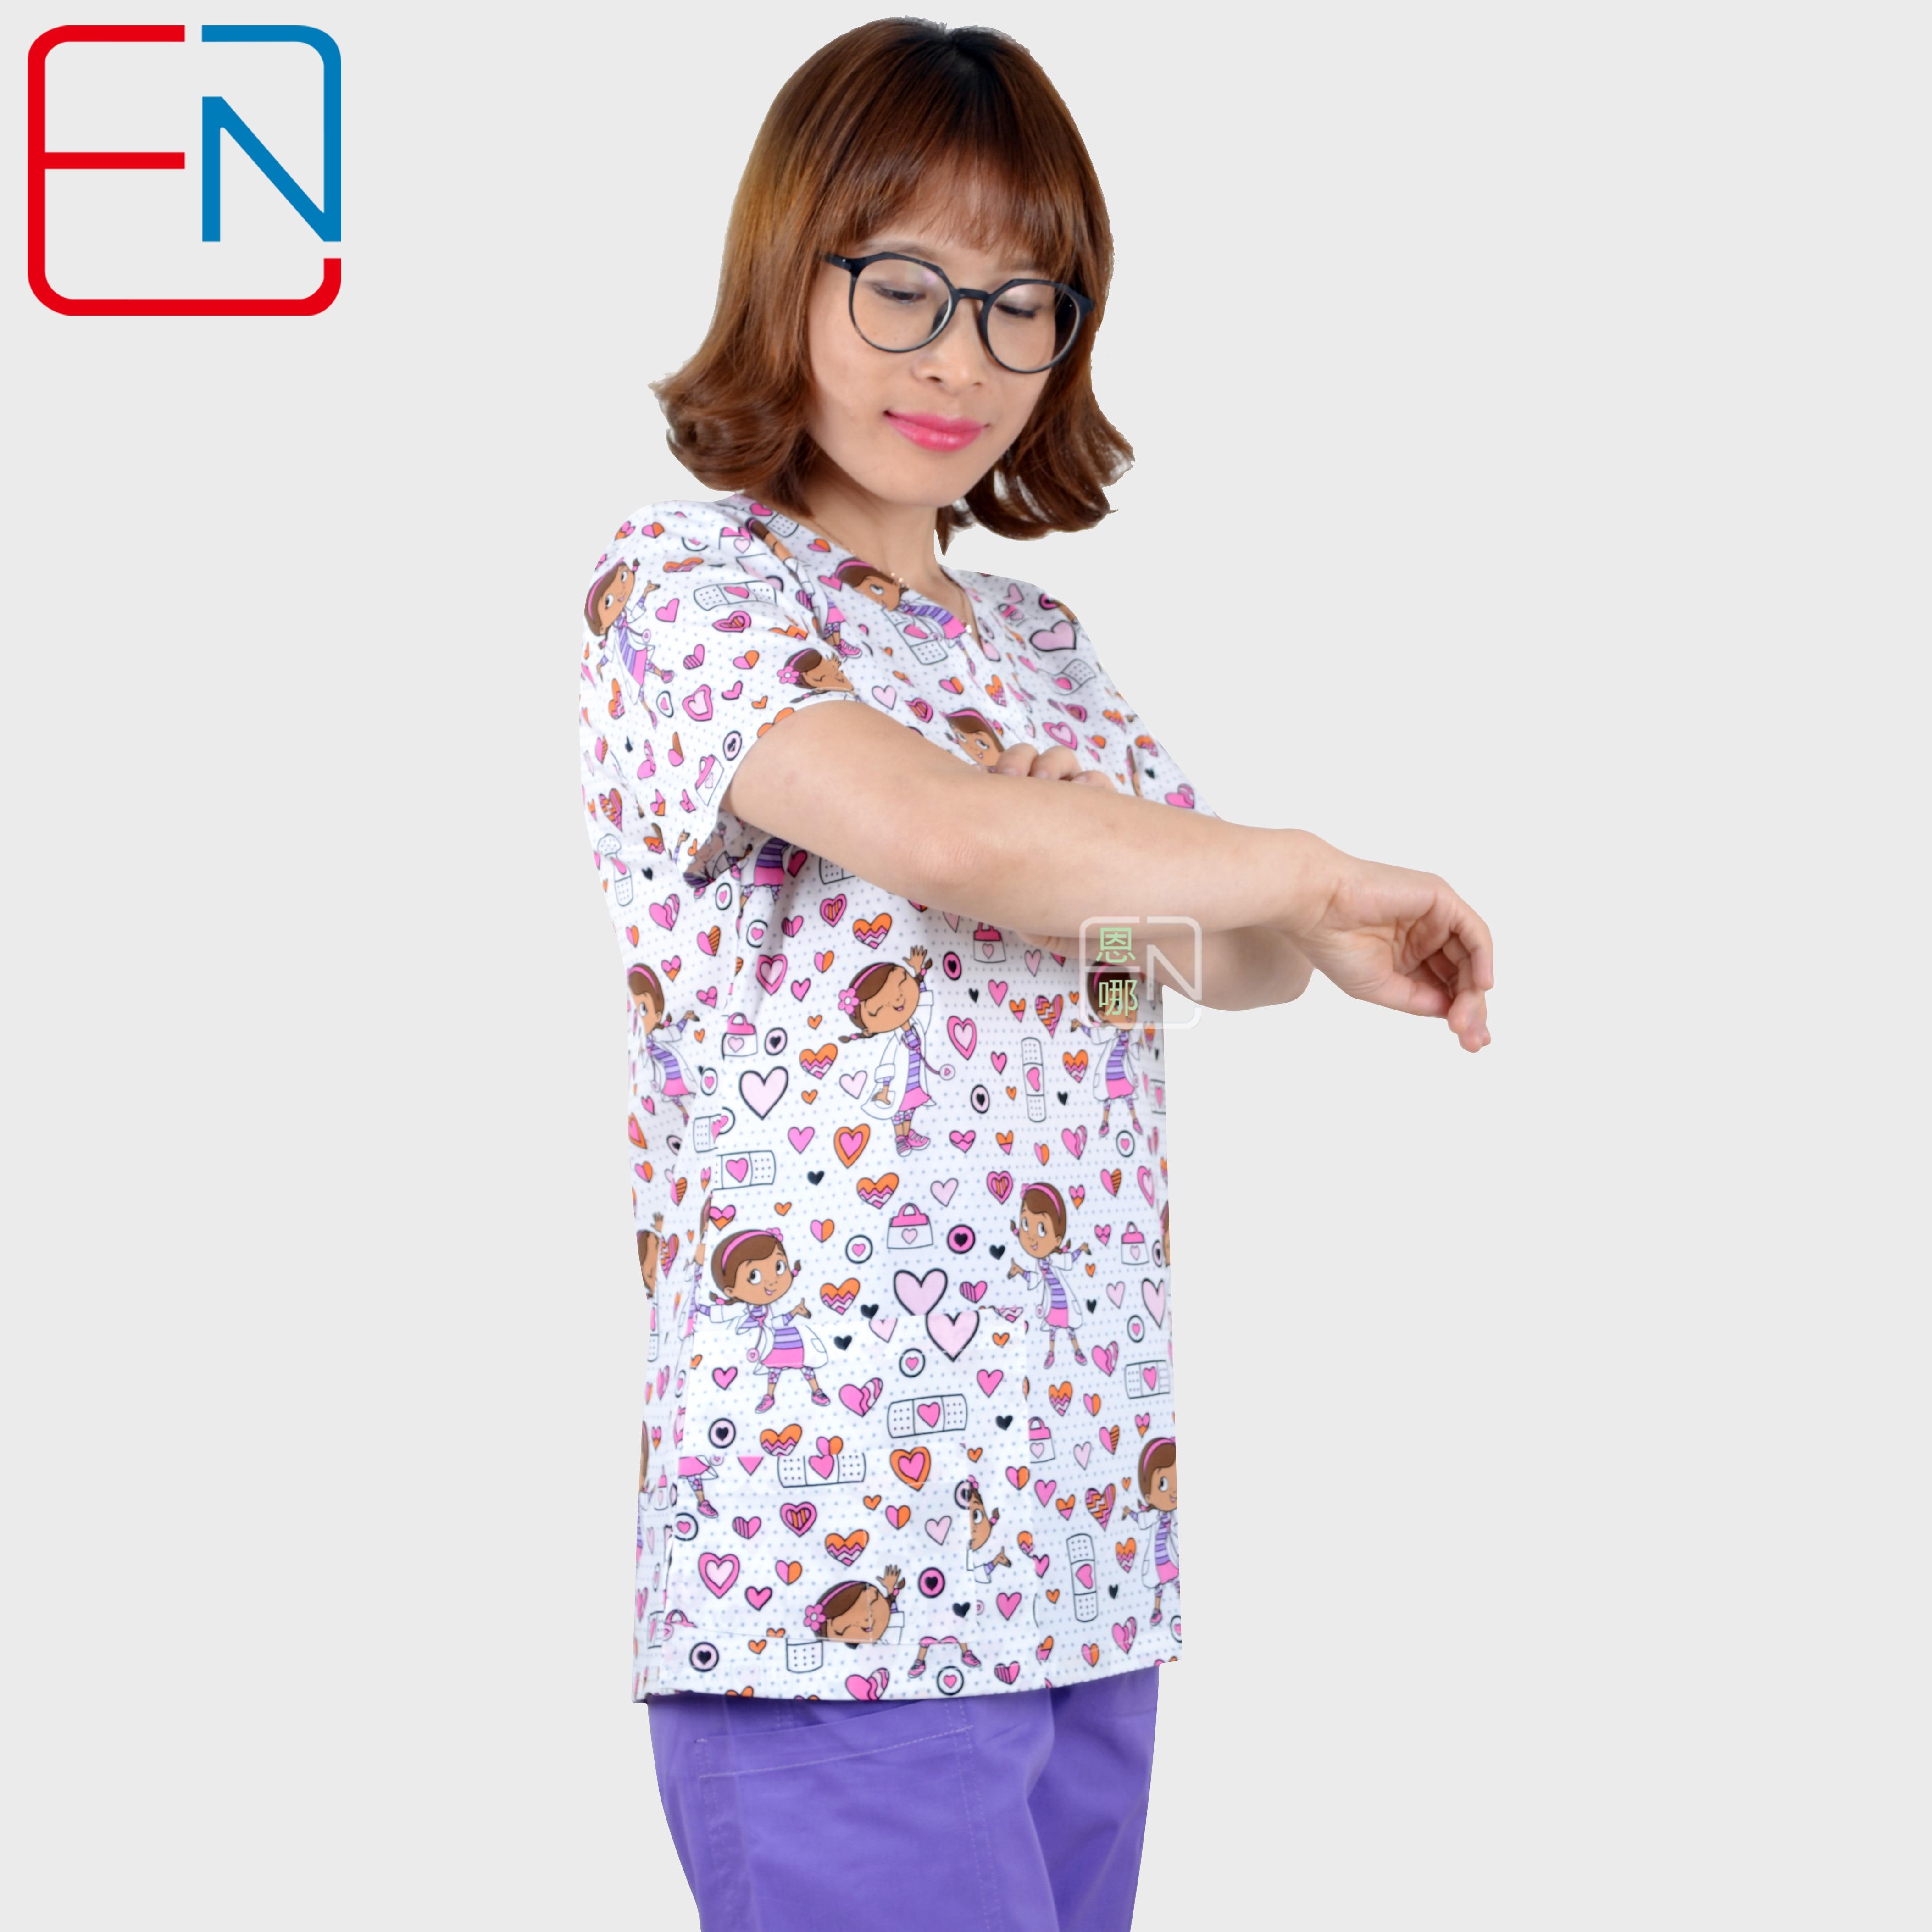 Hennar Women Scrub Uniforms In 100% Cotton Stretchy Fabric With Size Xxs-3xl Floral Prints Women Scrub Tops